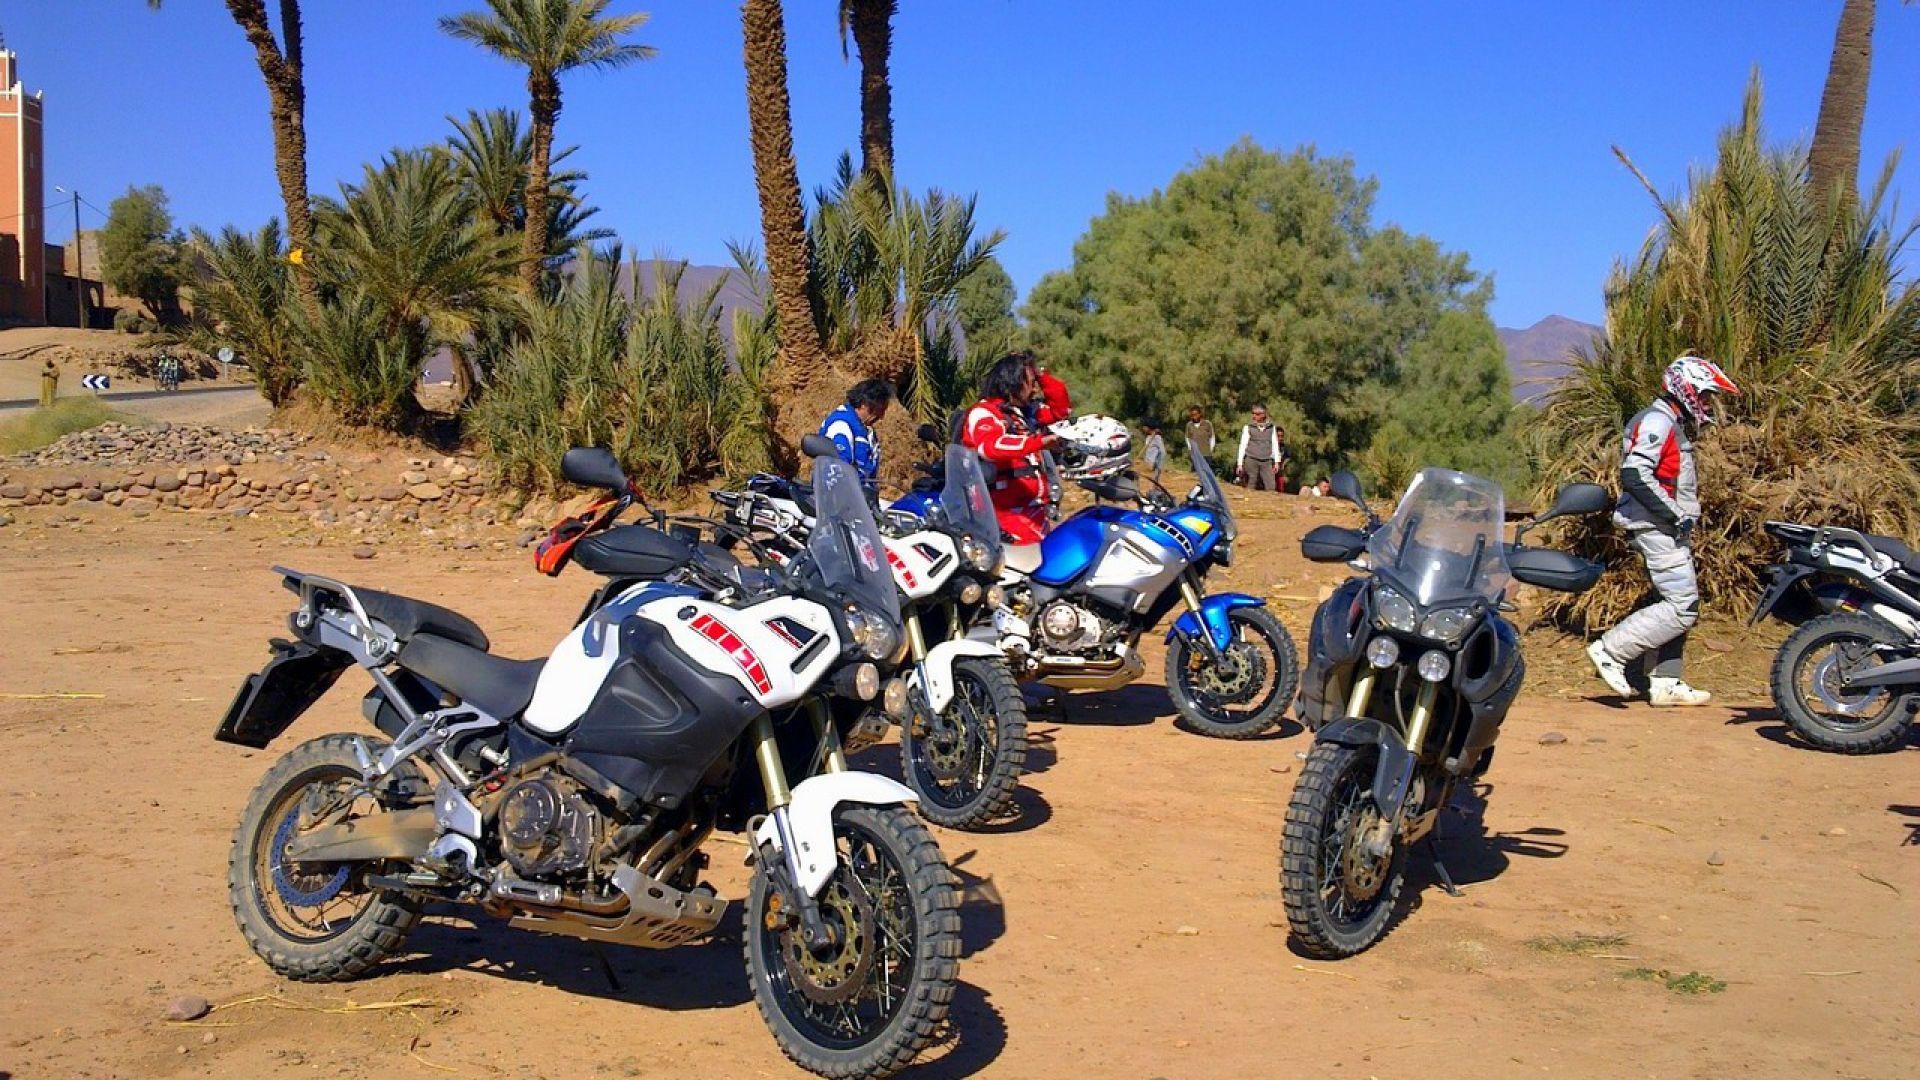 Immagine 142: In Marocco con la Yamaha Super Ténéré